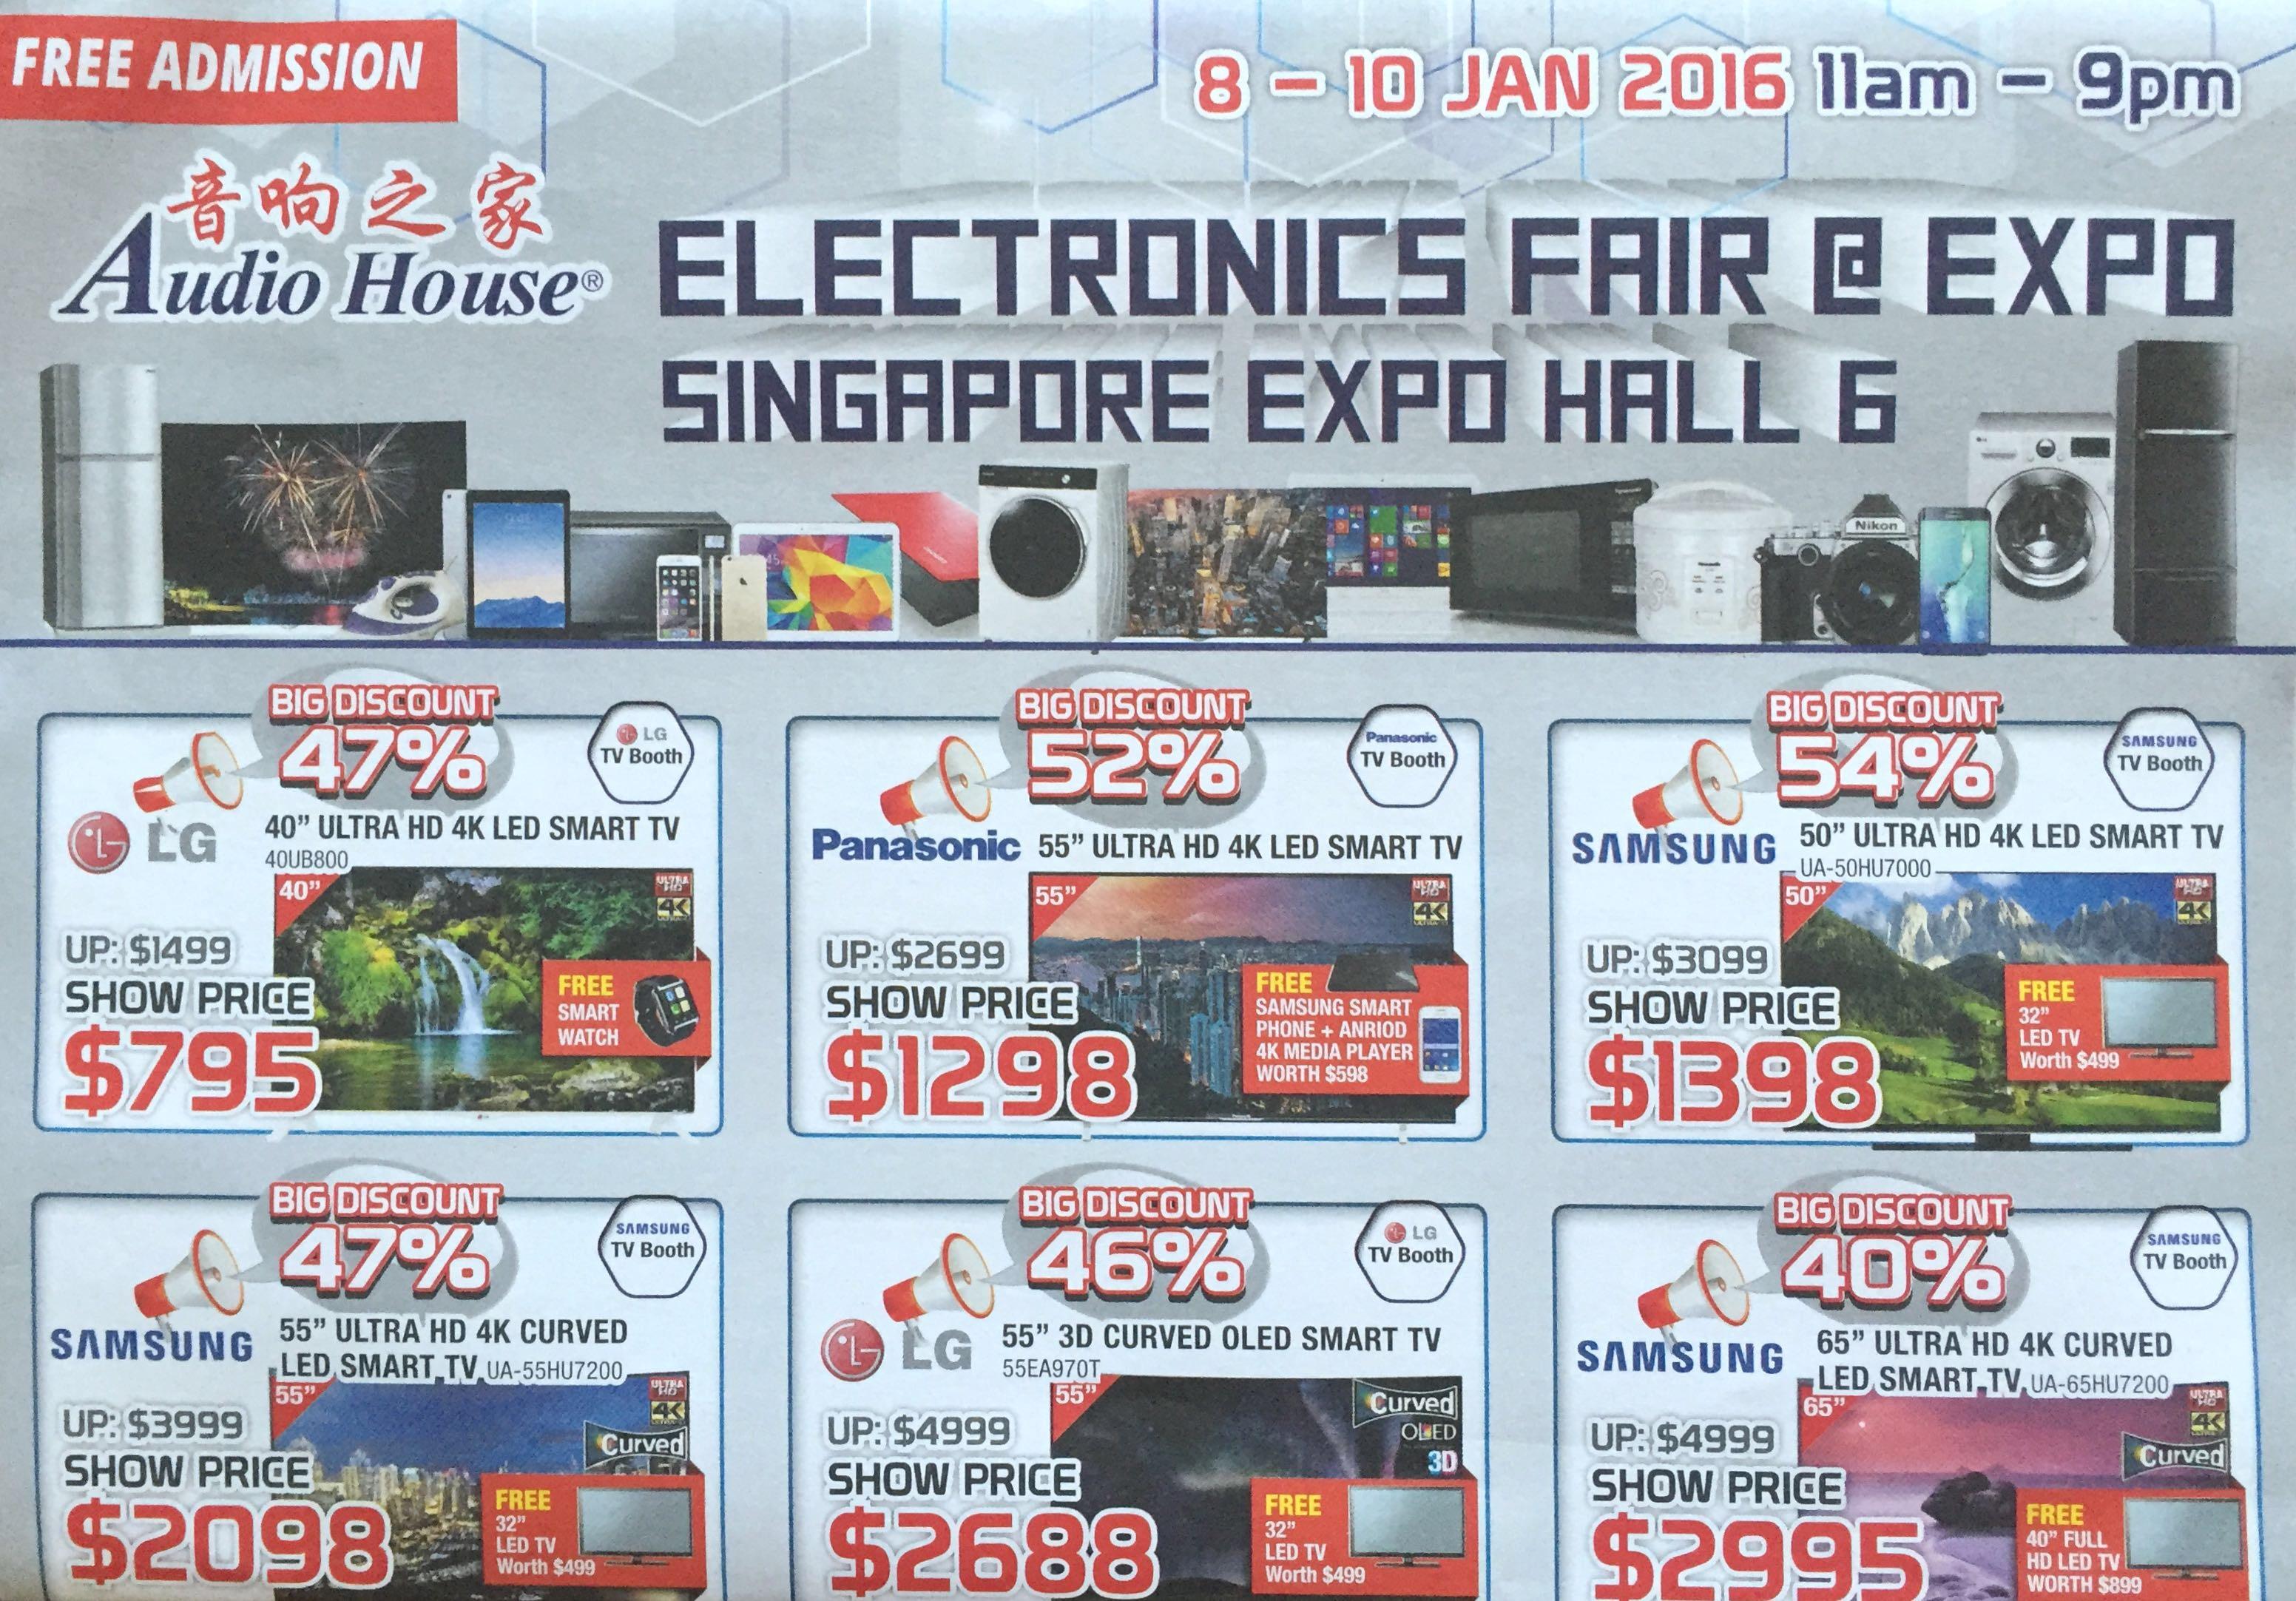 Electronics Fair @ EXPO | 8 - 10 January 2016 | by Audio House | pg1